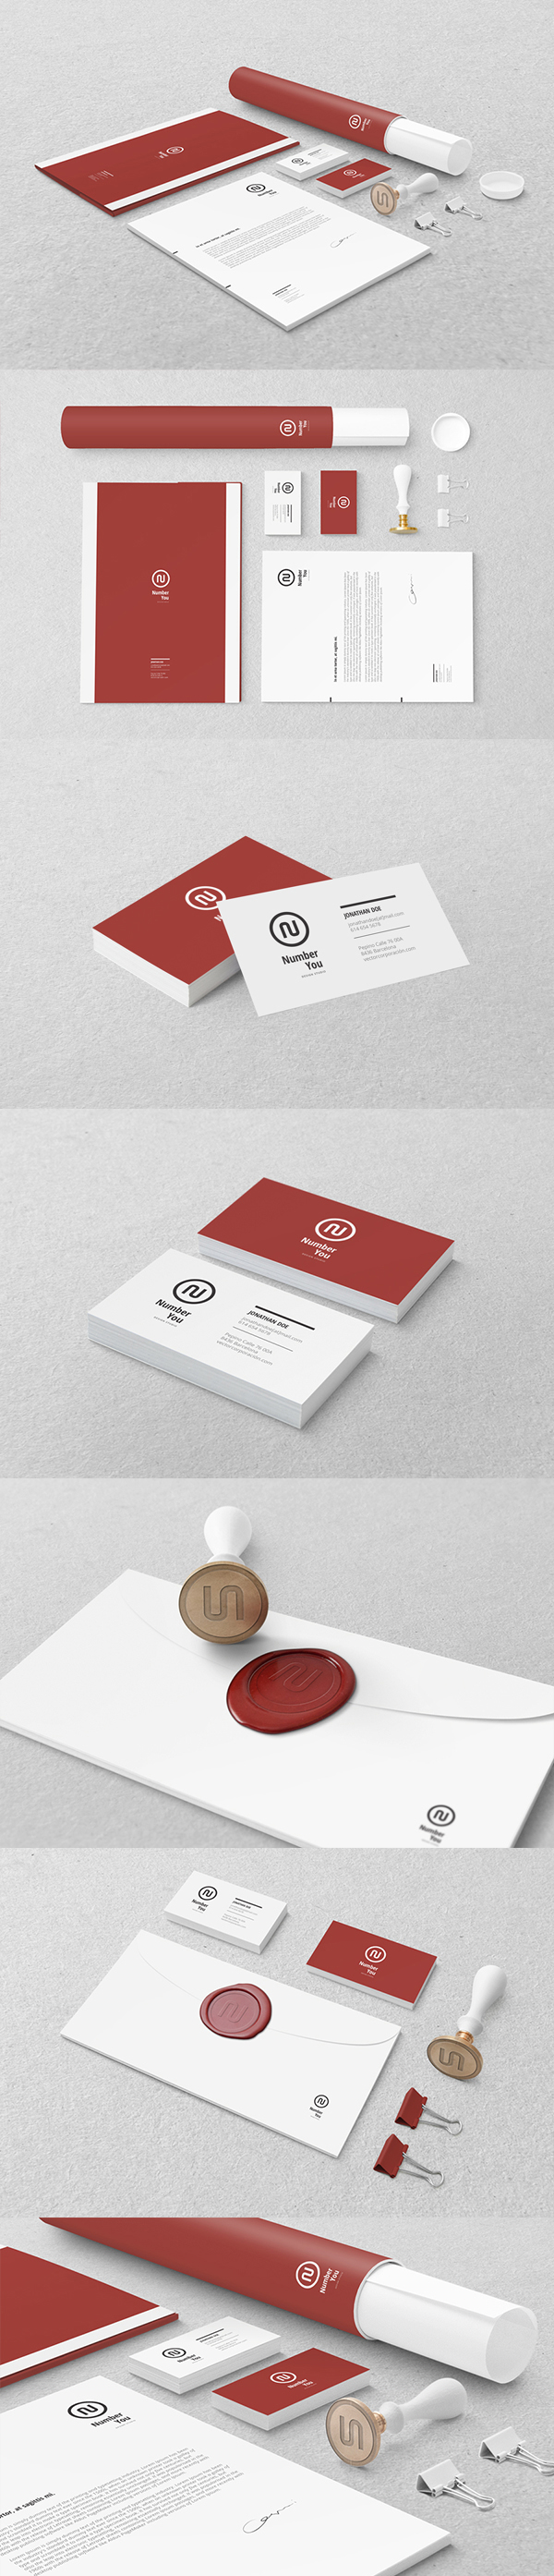 06 Branding : Identity Mock-up